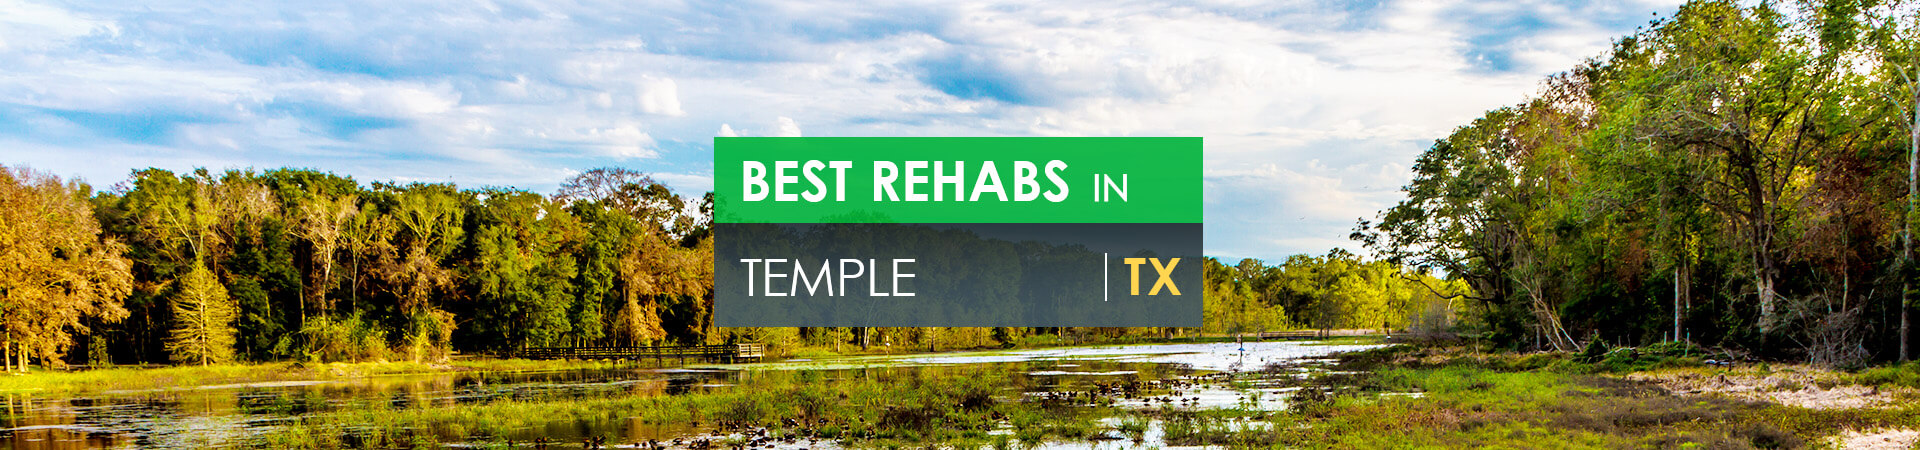 Best rehabs in Temple, TX